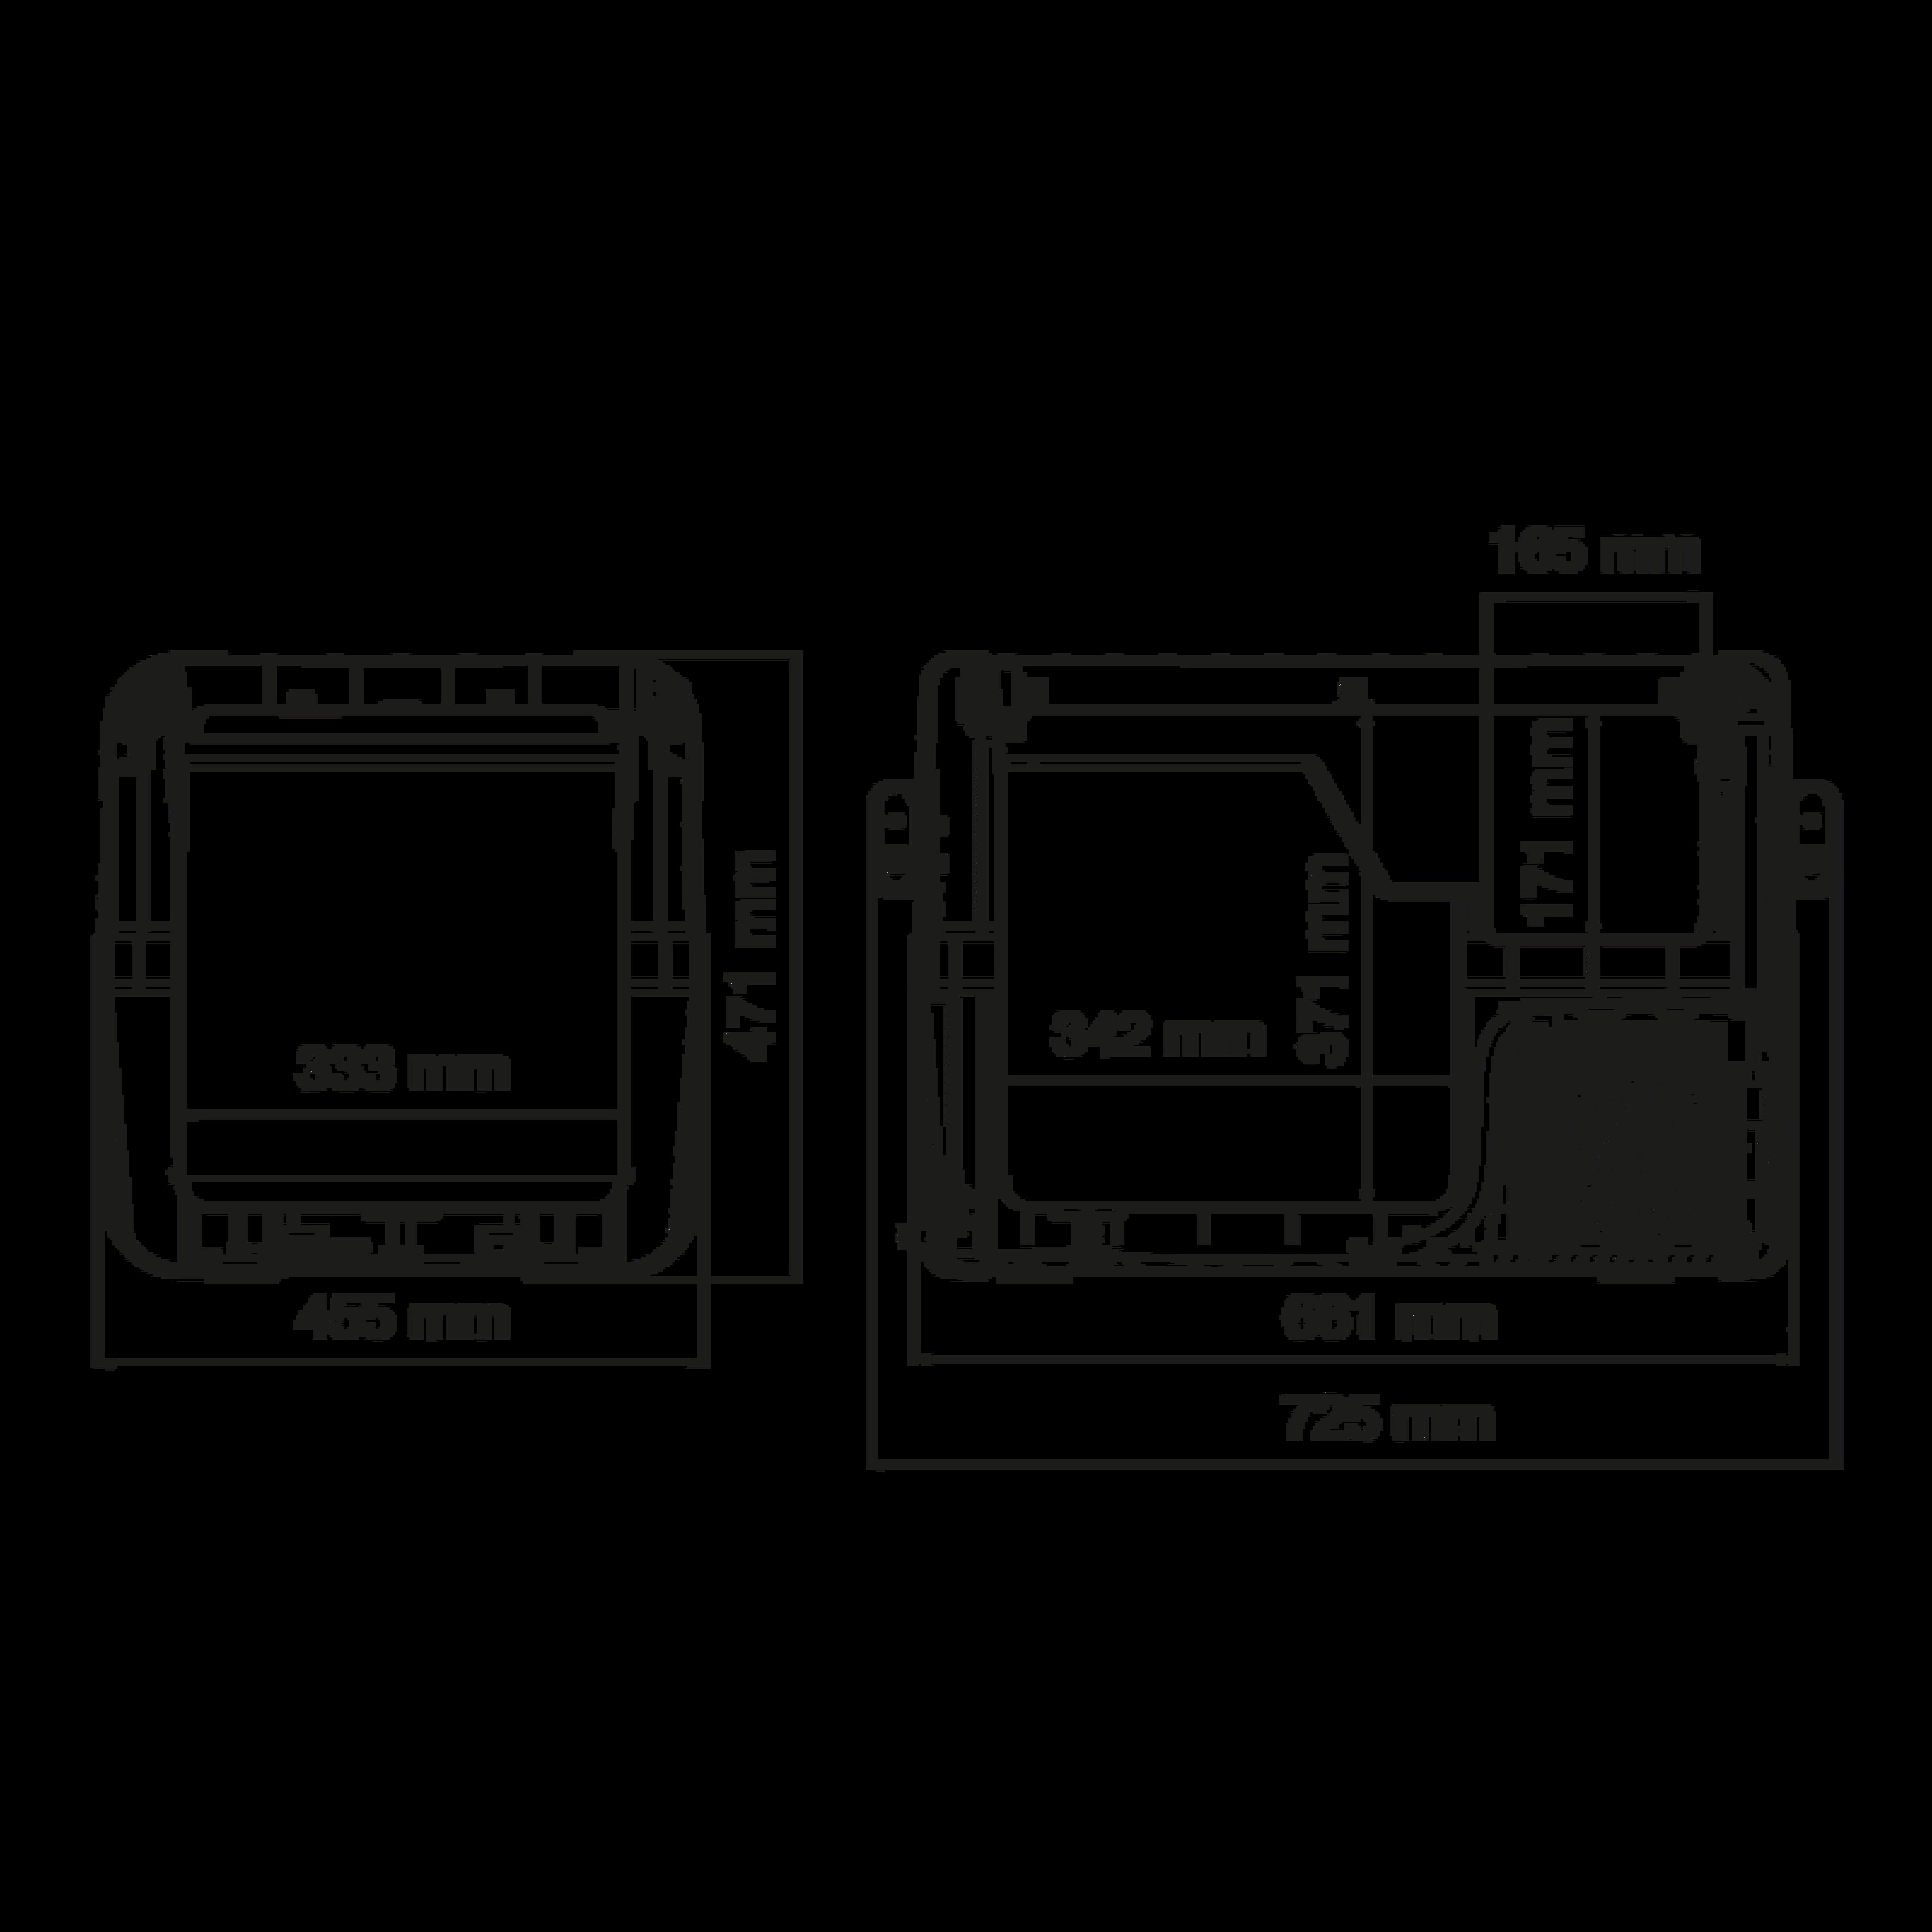 CFX 50 Dimensions